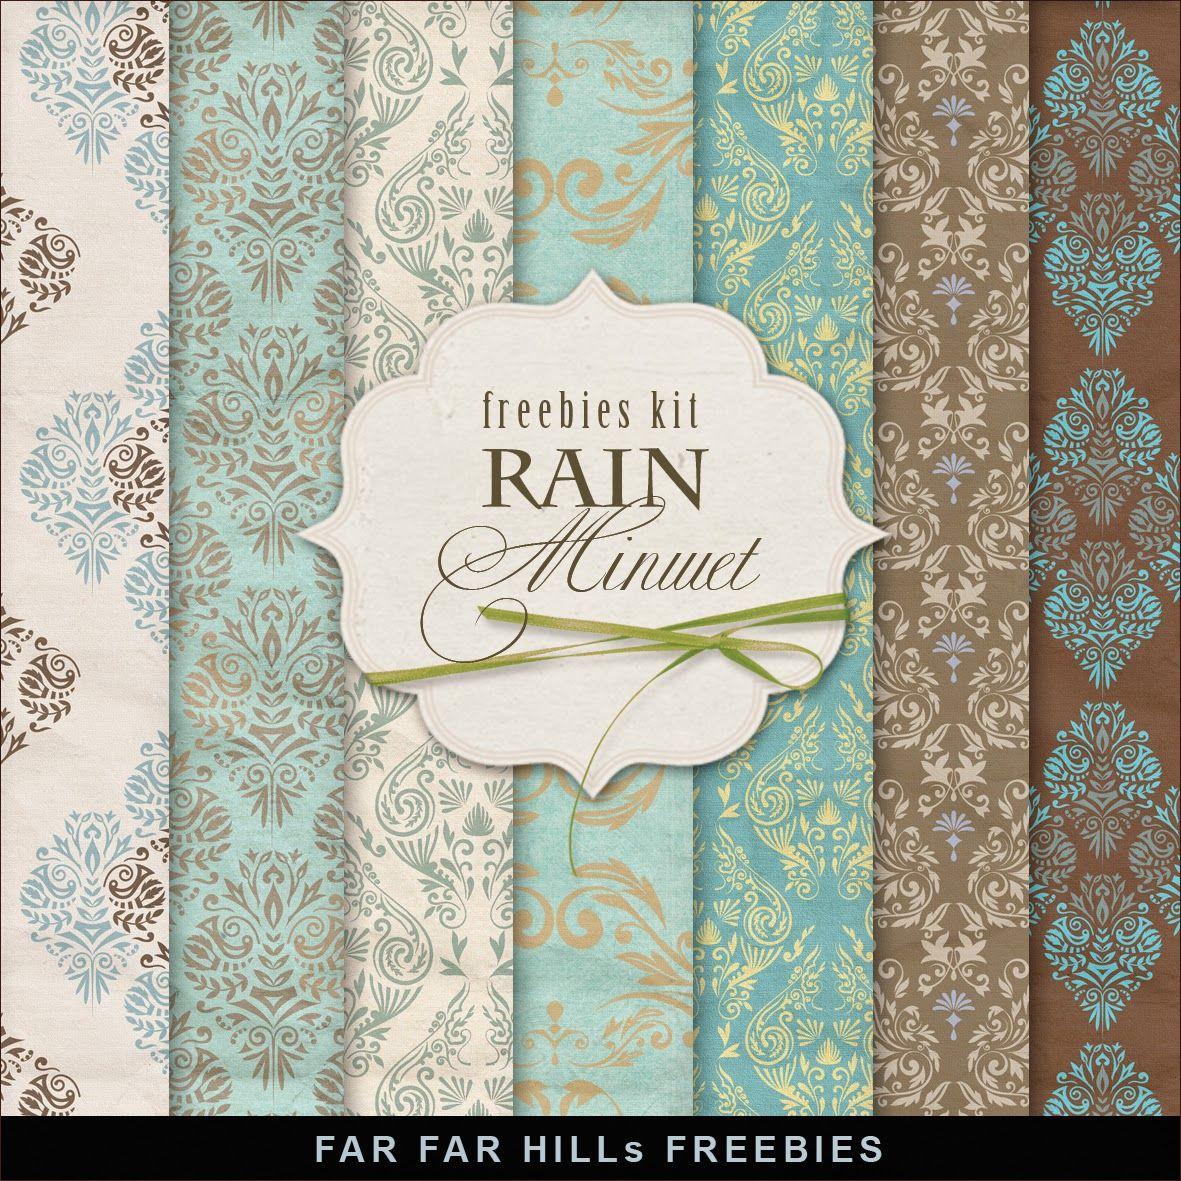 New Freebies Kit of Backgrounds - Minuet Rain